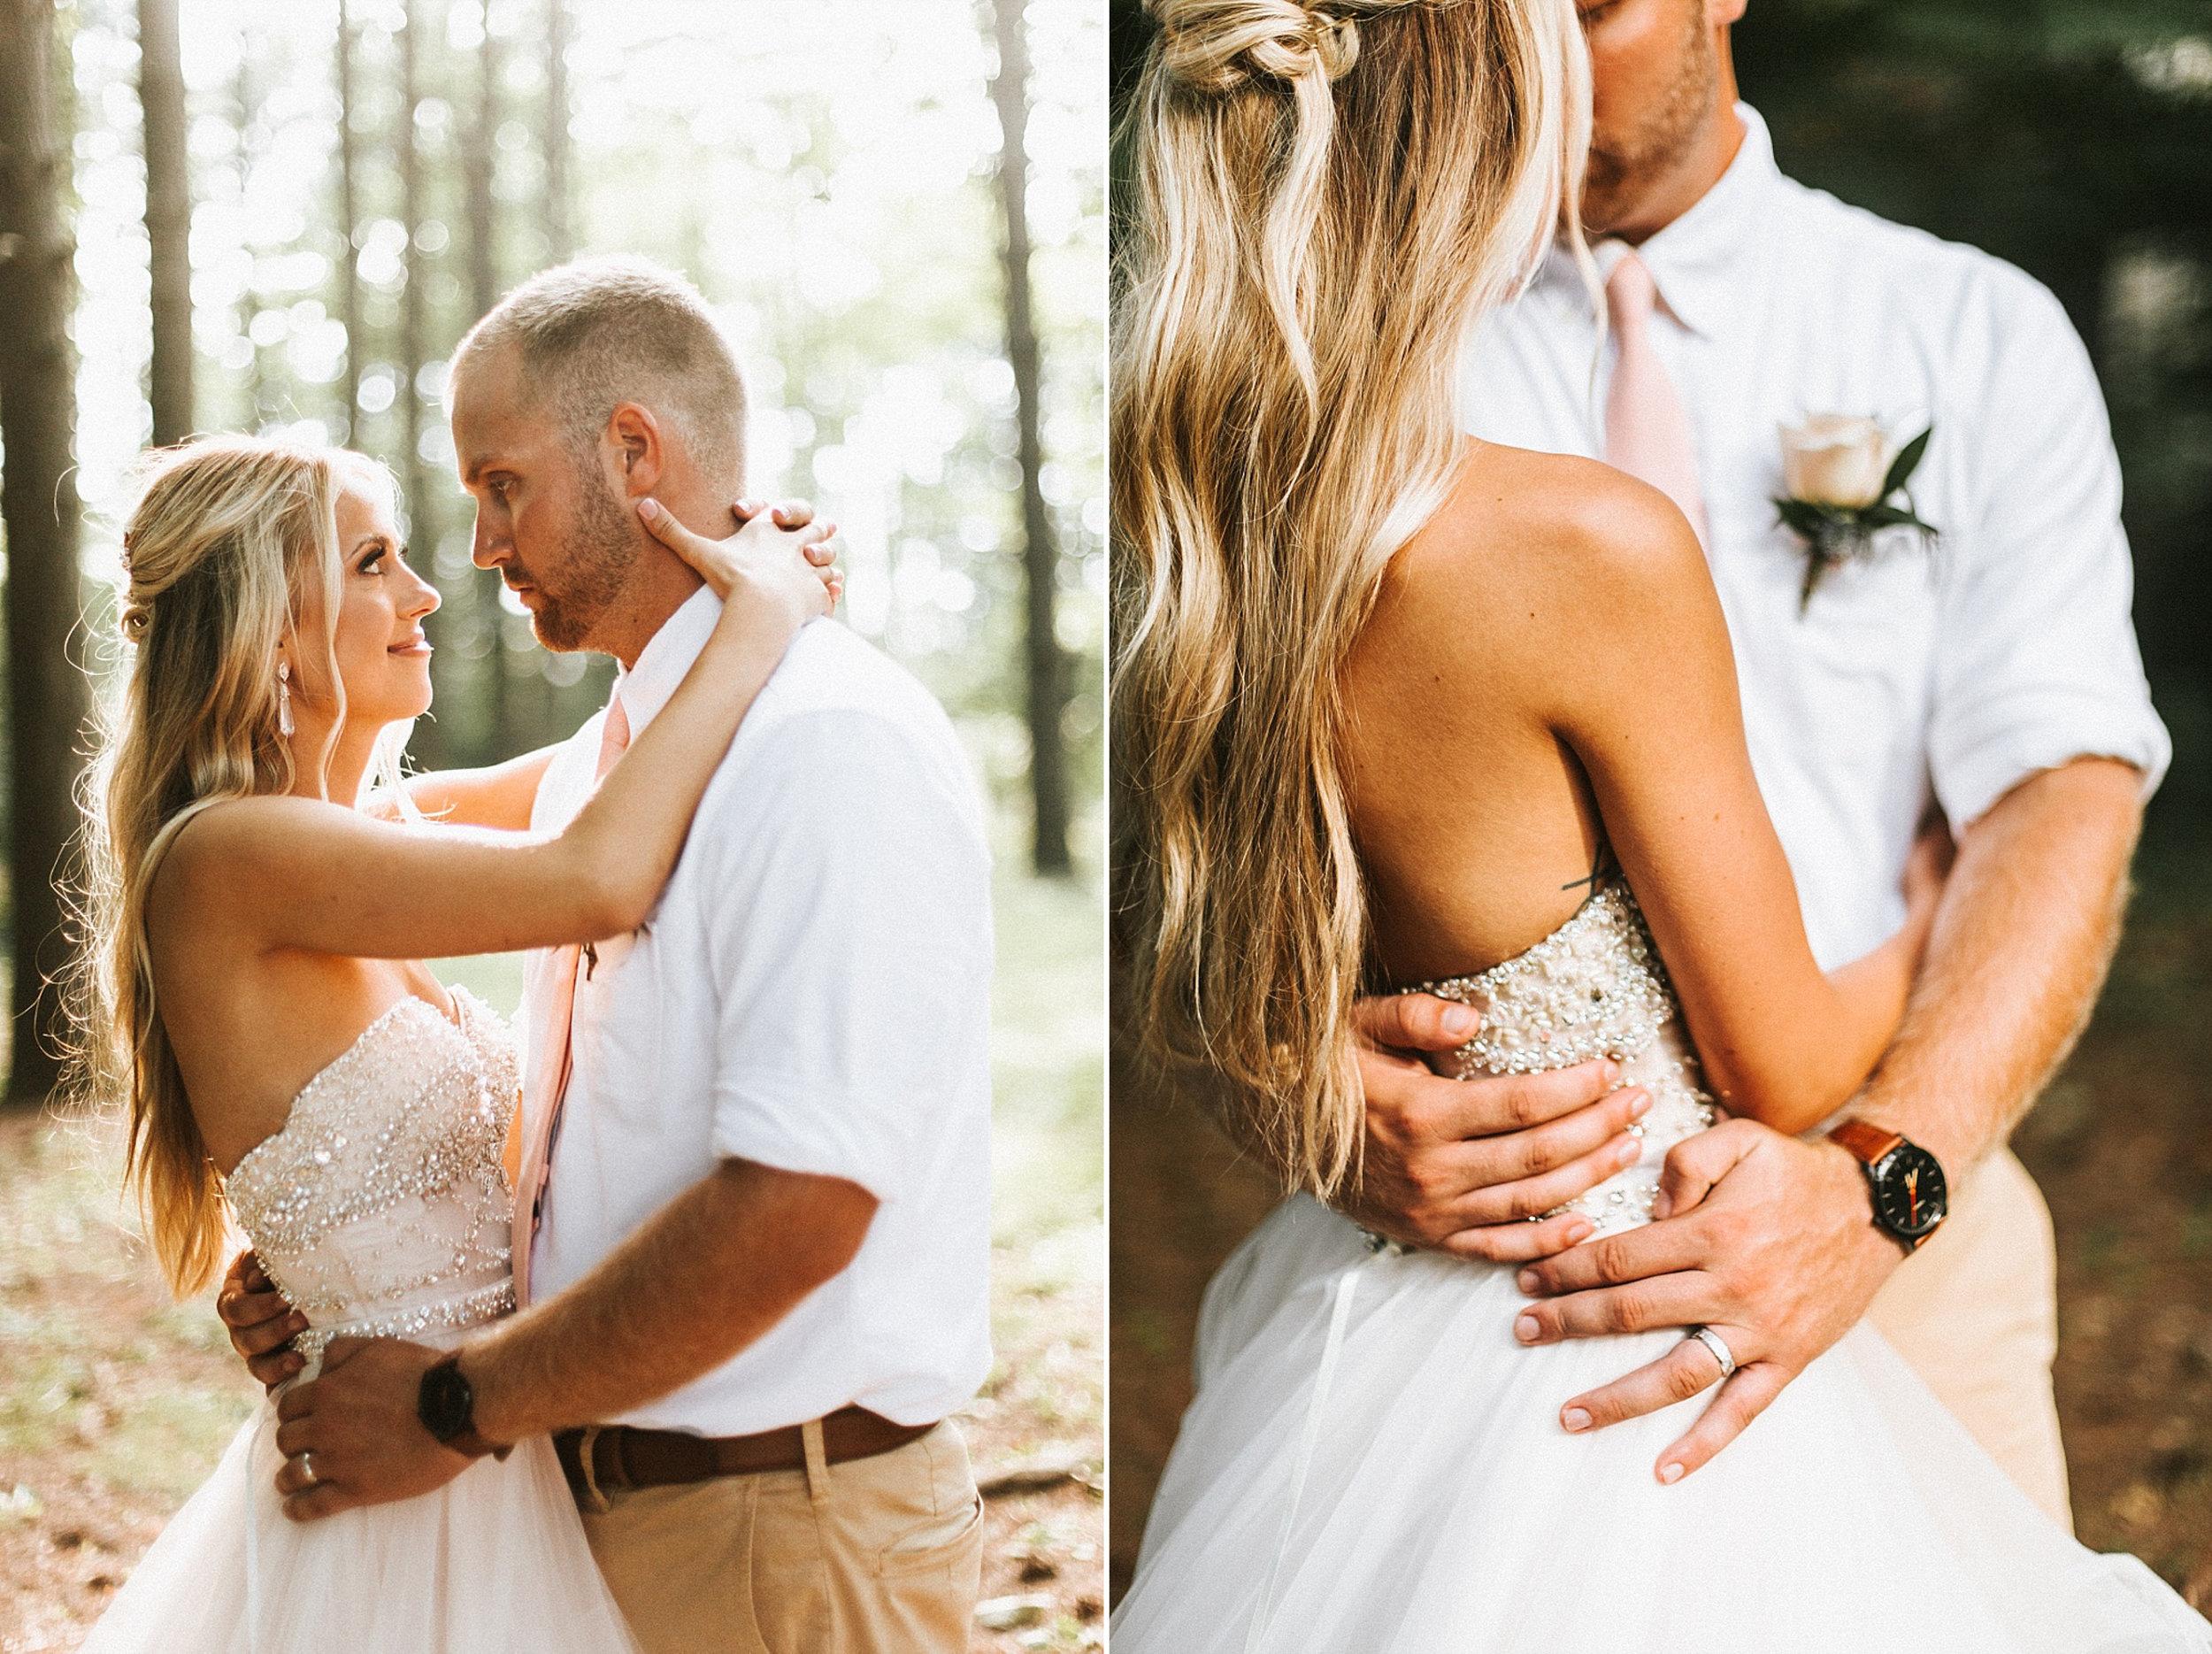 Brooke Townsend Photography - Cincinnati Wedding Photographer (116 of 153).jpg